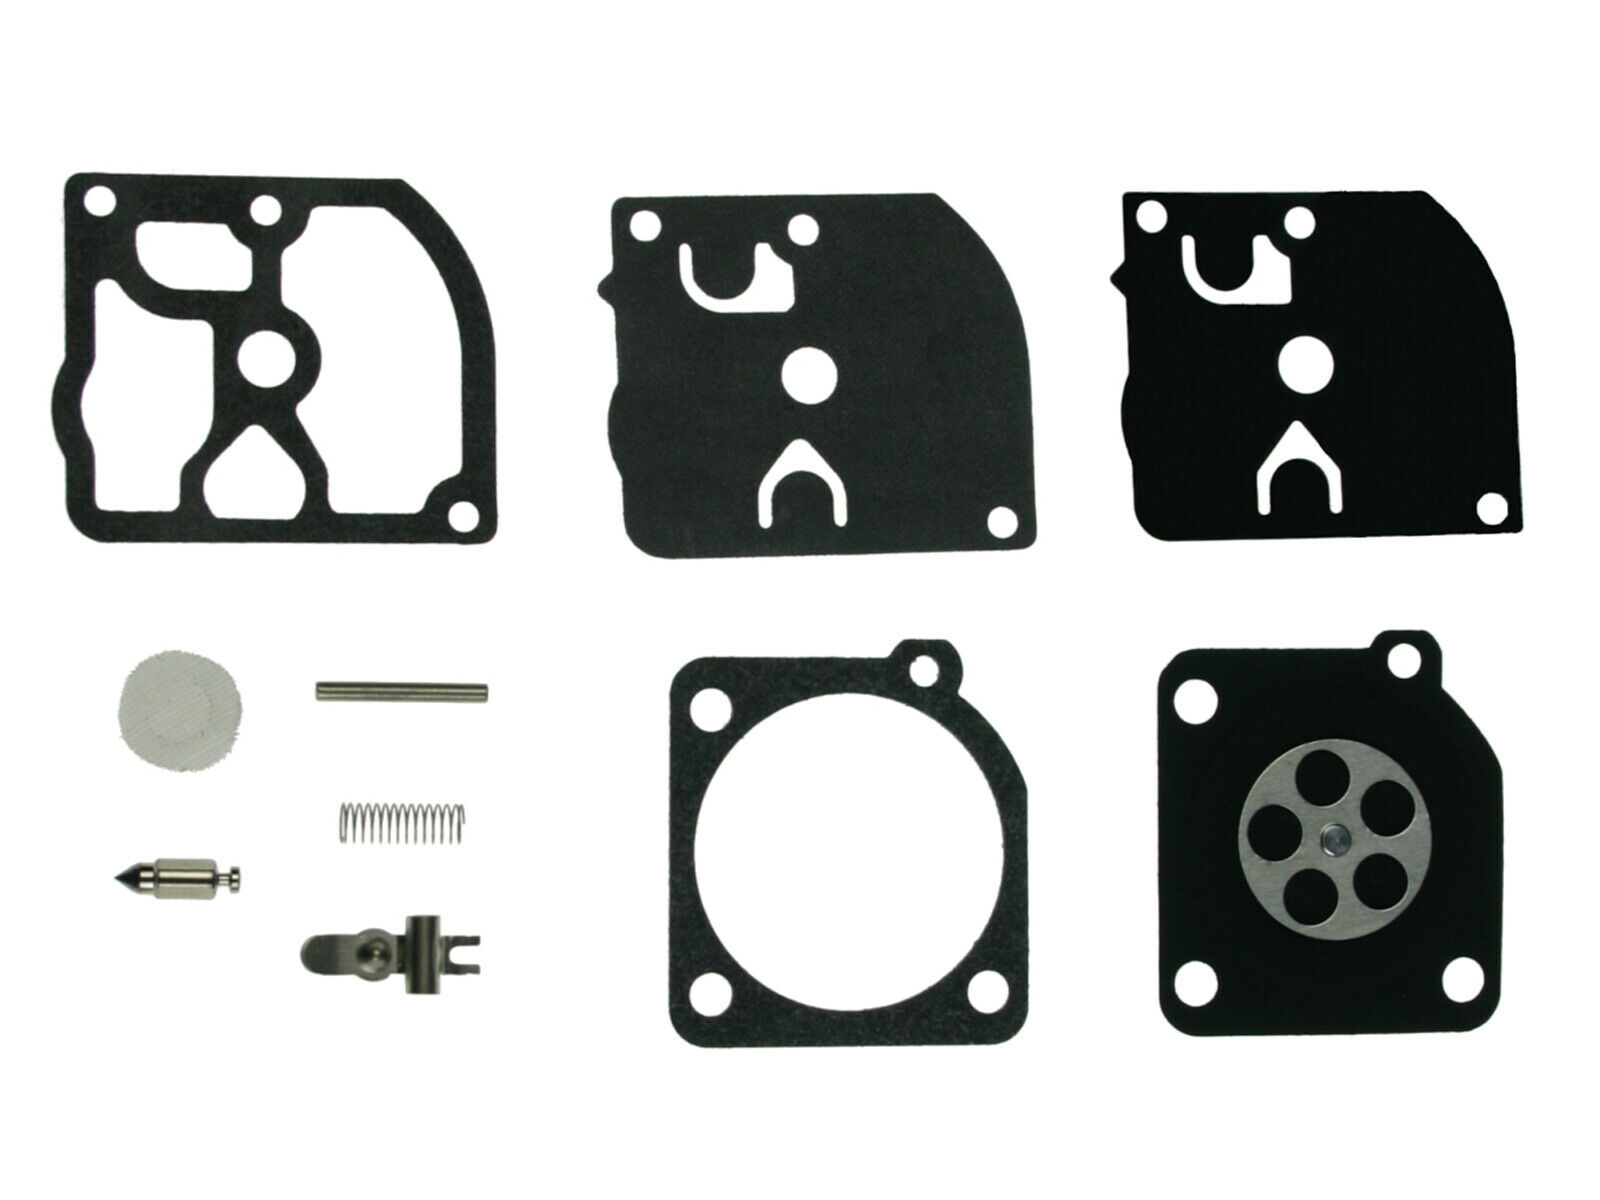 für Stihl 046 MS460 MS 460 carburator diaphragm kit ZAMA Membransatz